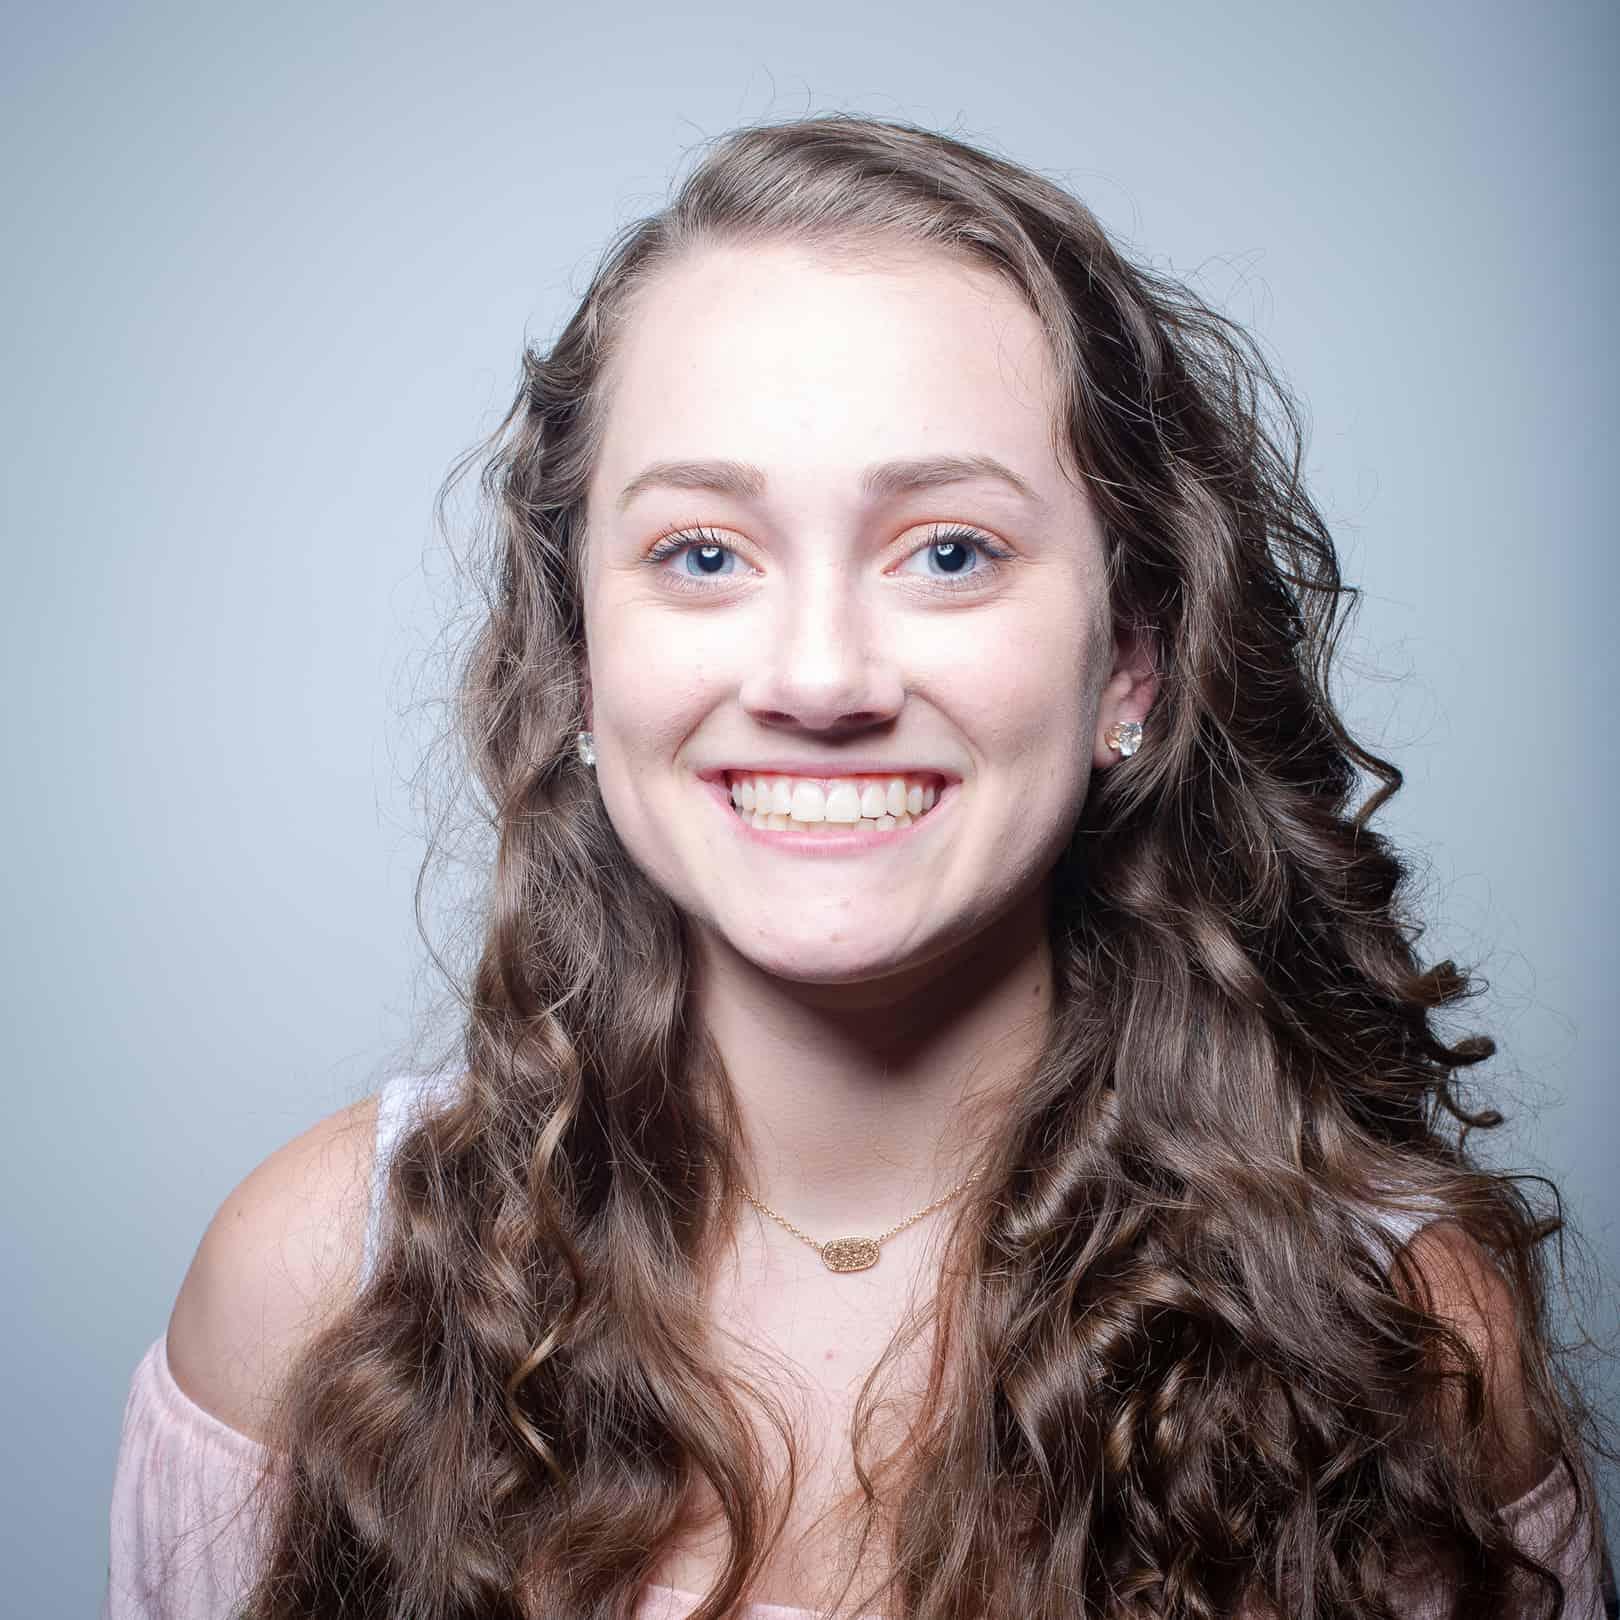 Reuland Orthodontics Patient Portraits 5 - Our Beautiful Smiles